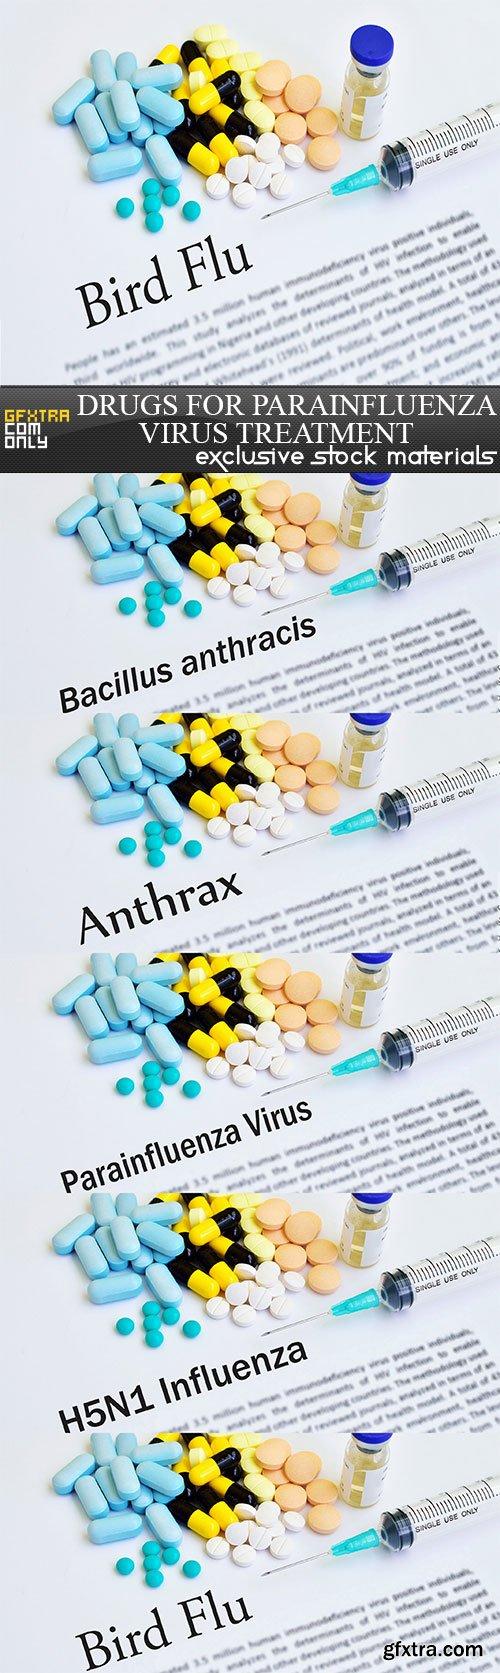 Drugs for Parainfluenza virus treatment, 5 x UHQ JPEG